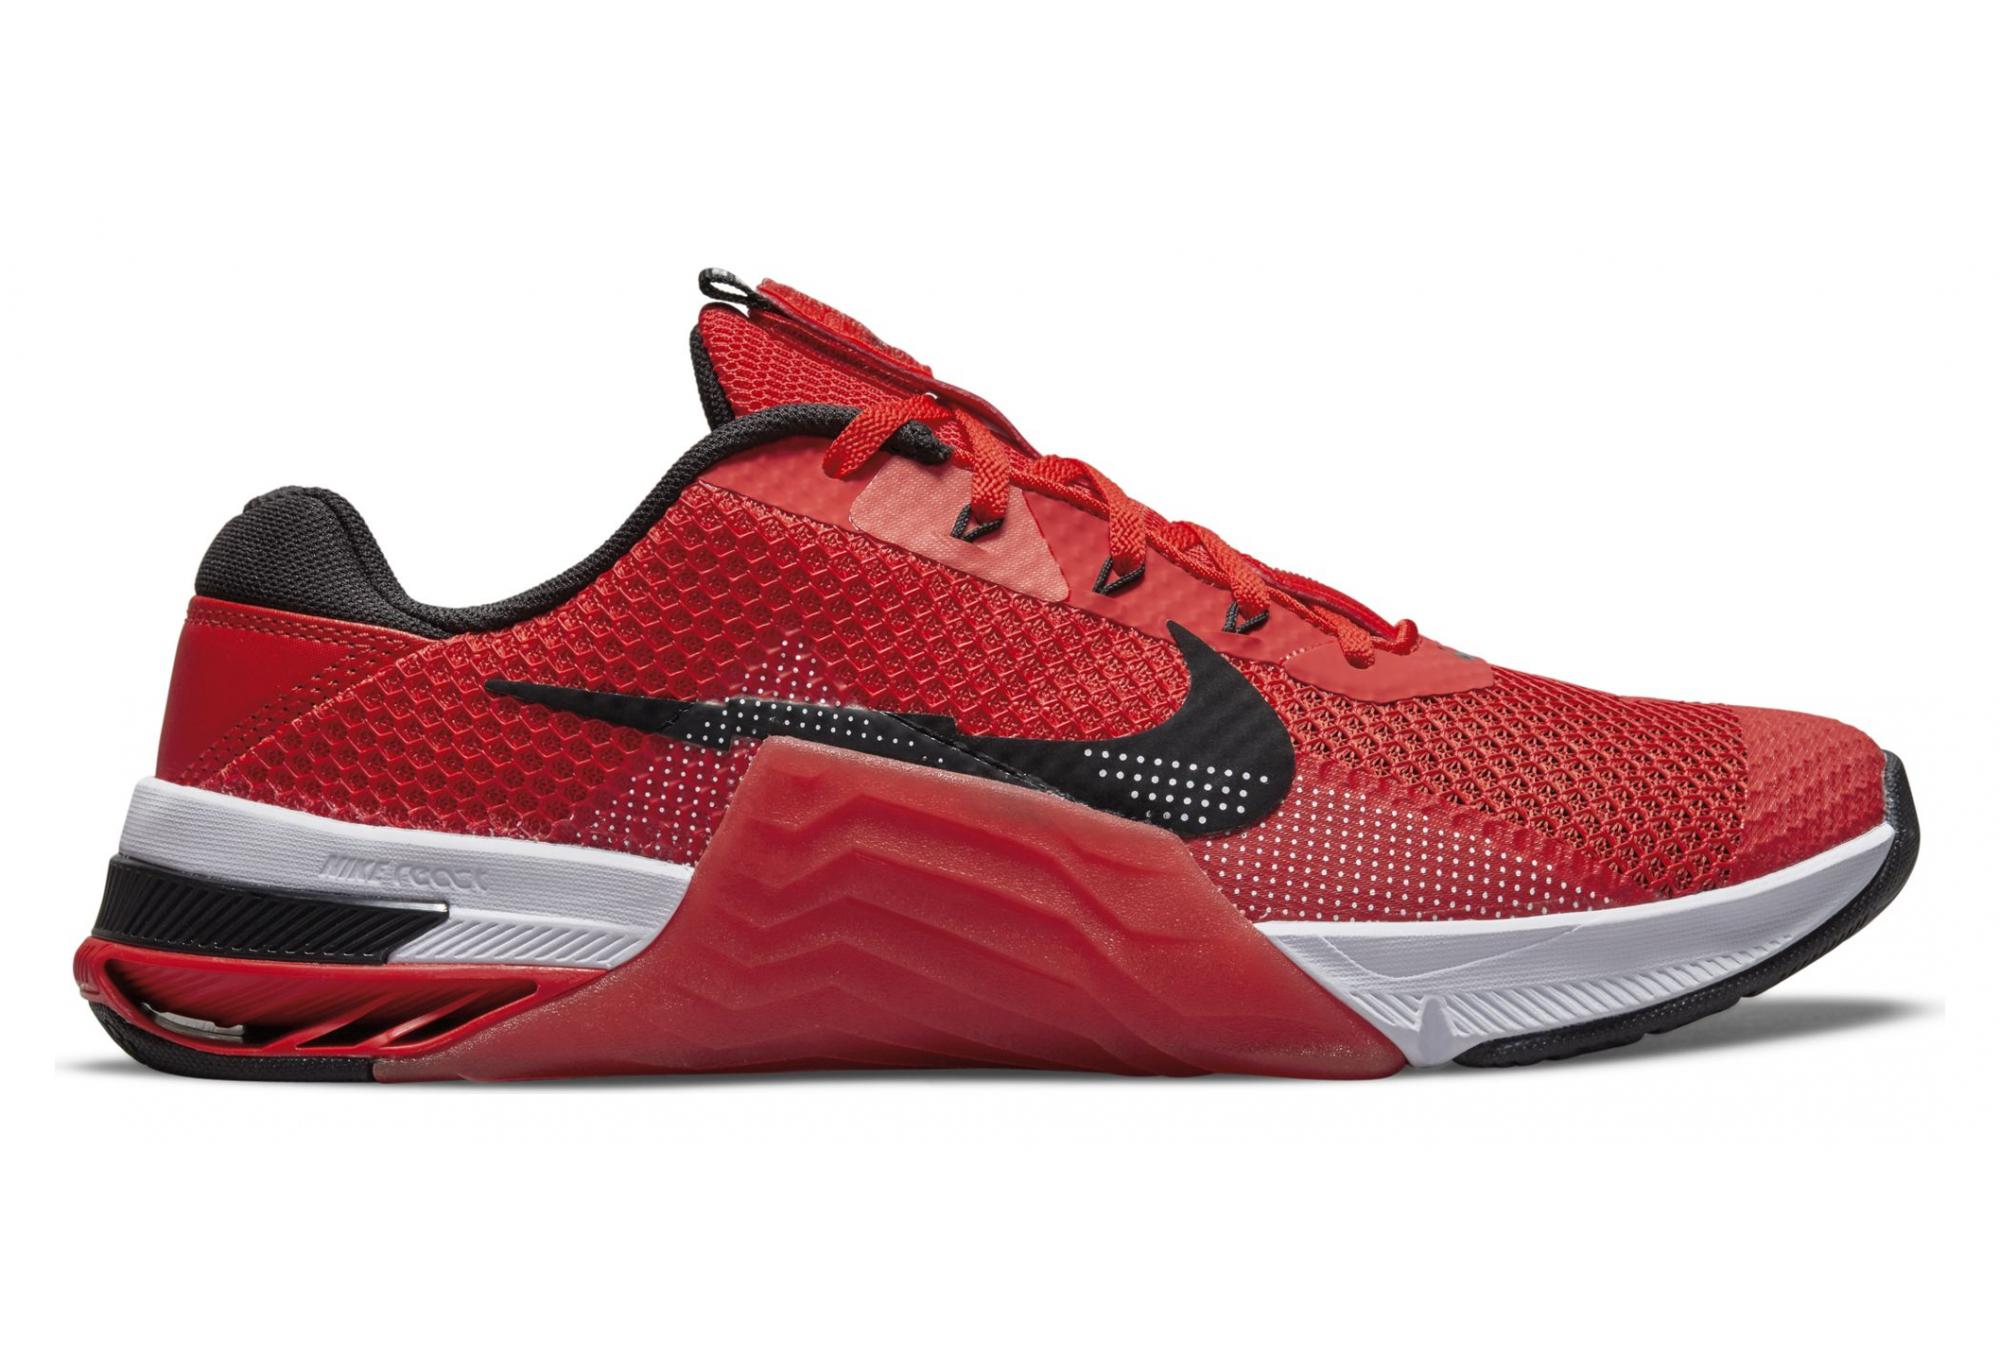 Nike Metcon 7 Running Shoes Red Black